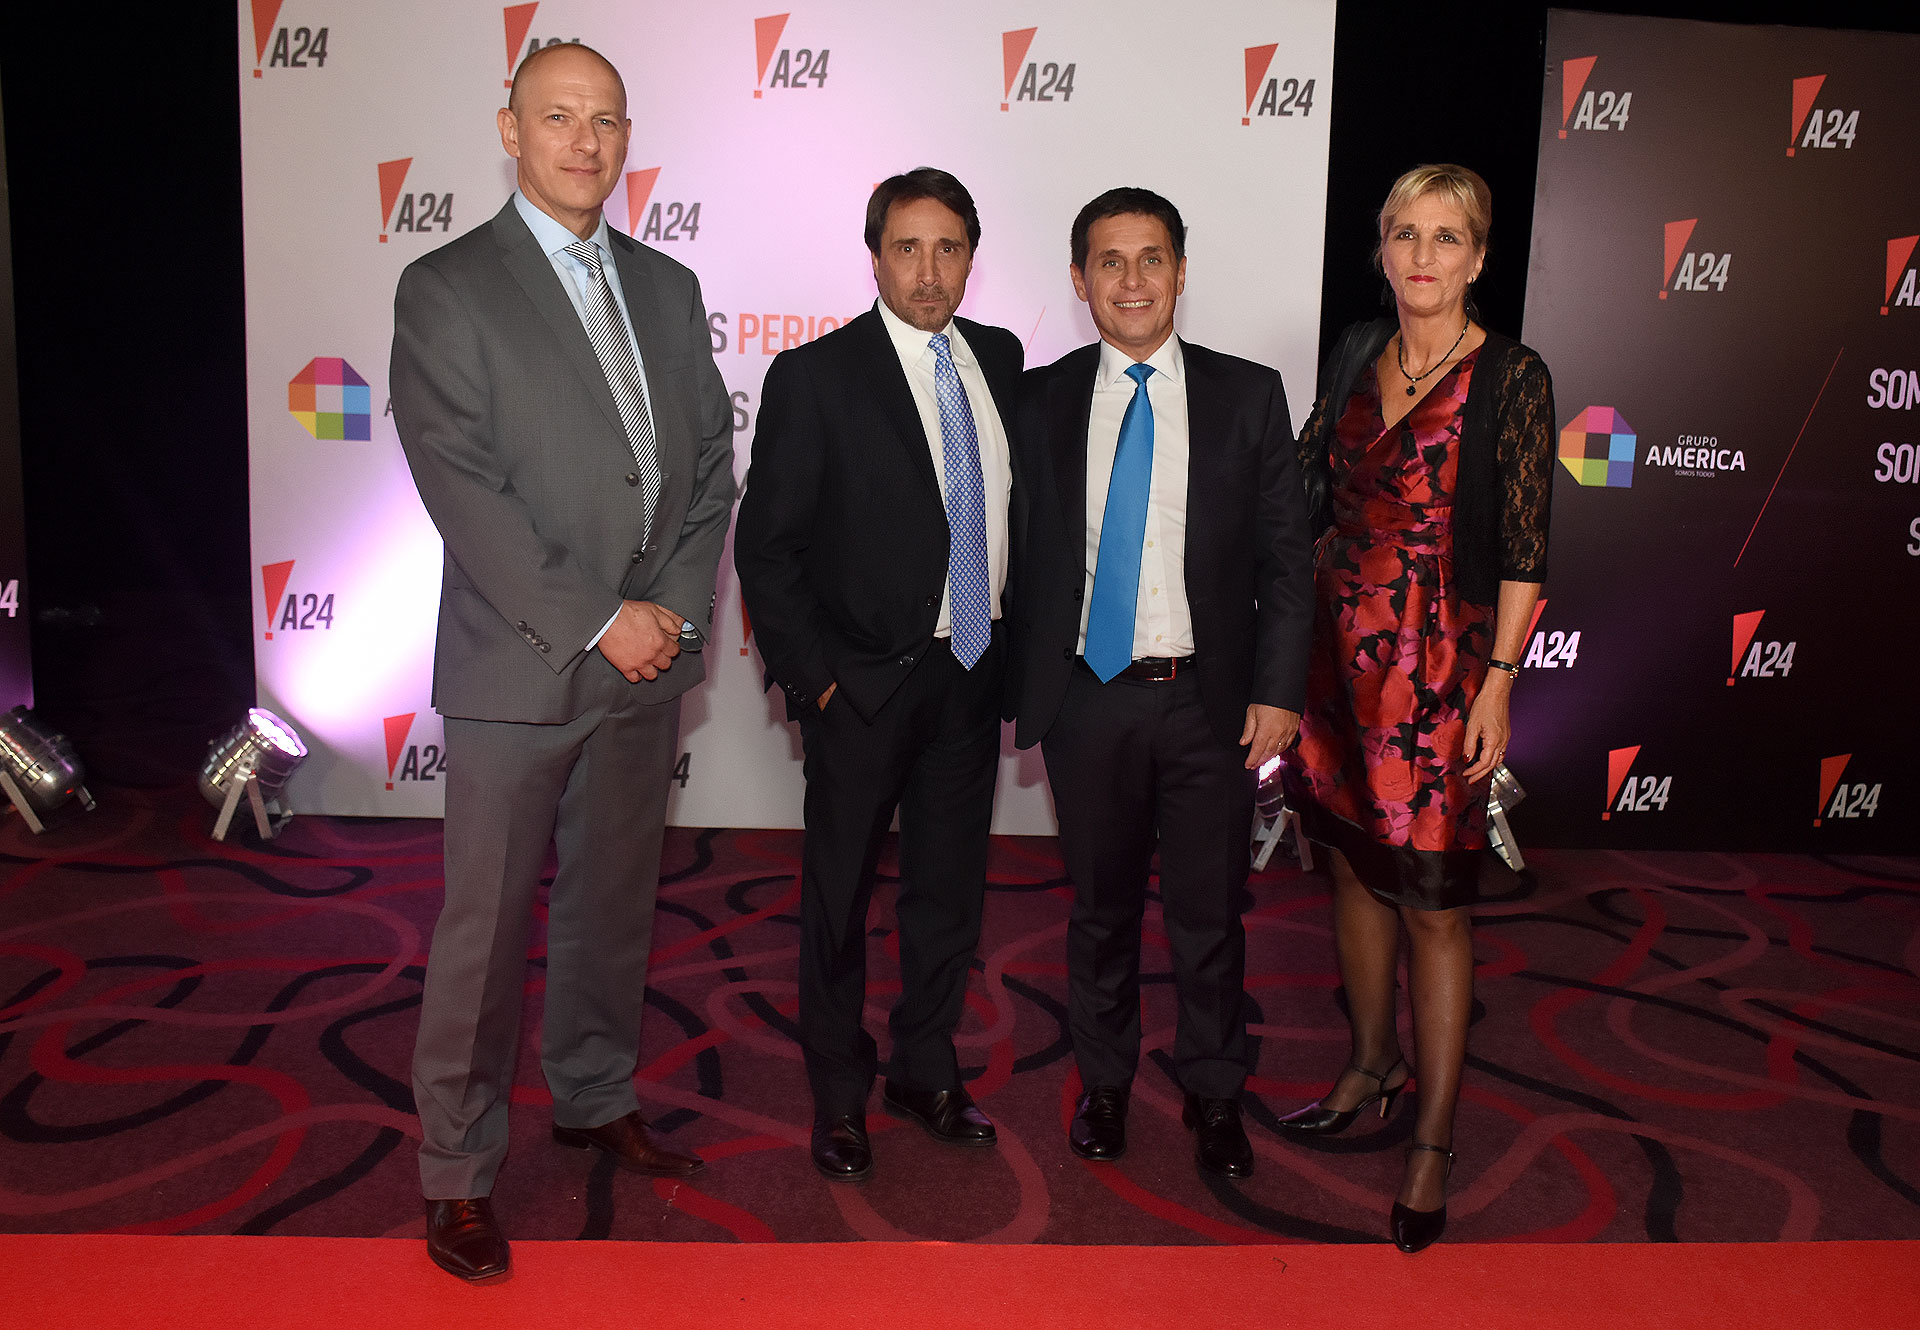 Sergio Berensztein, Eduardo Feinmann, Fernando Carnota y Liliana Franco